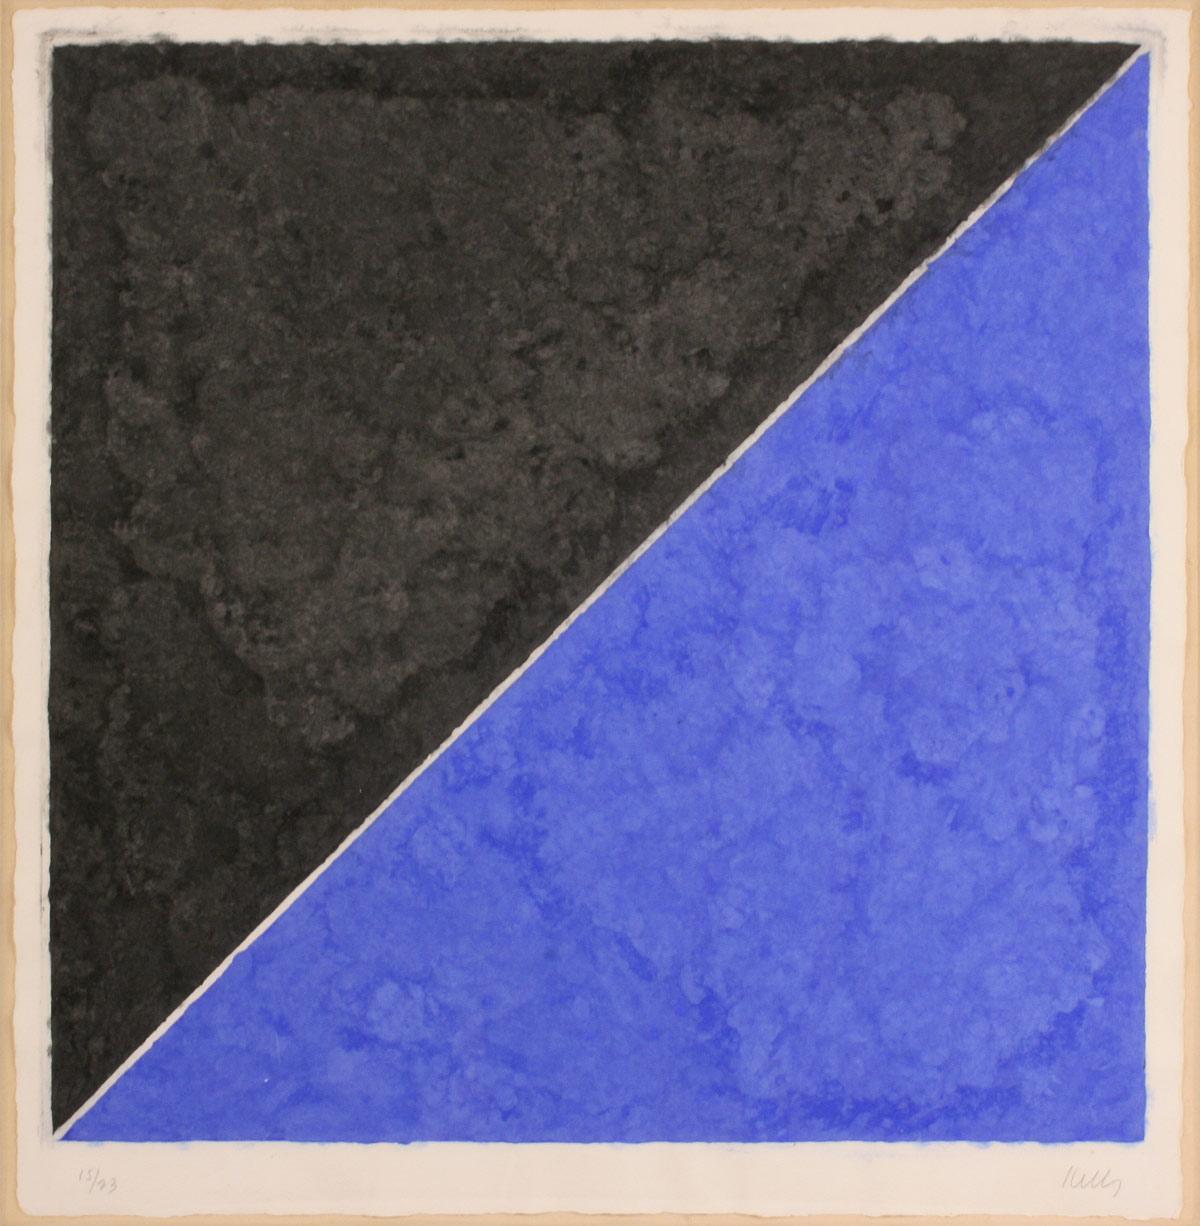 Lot 274: Ellsworth Kelly, colored paper image XV (dark gray